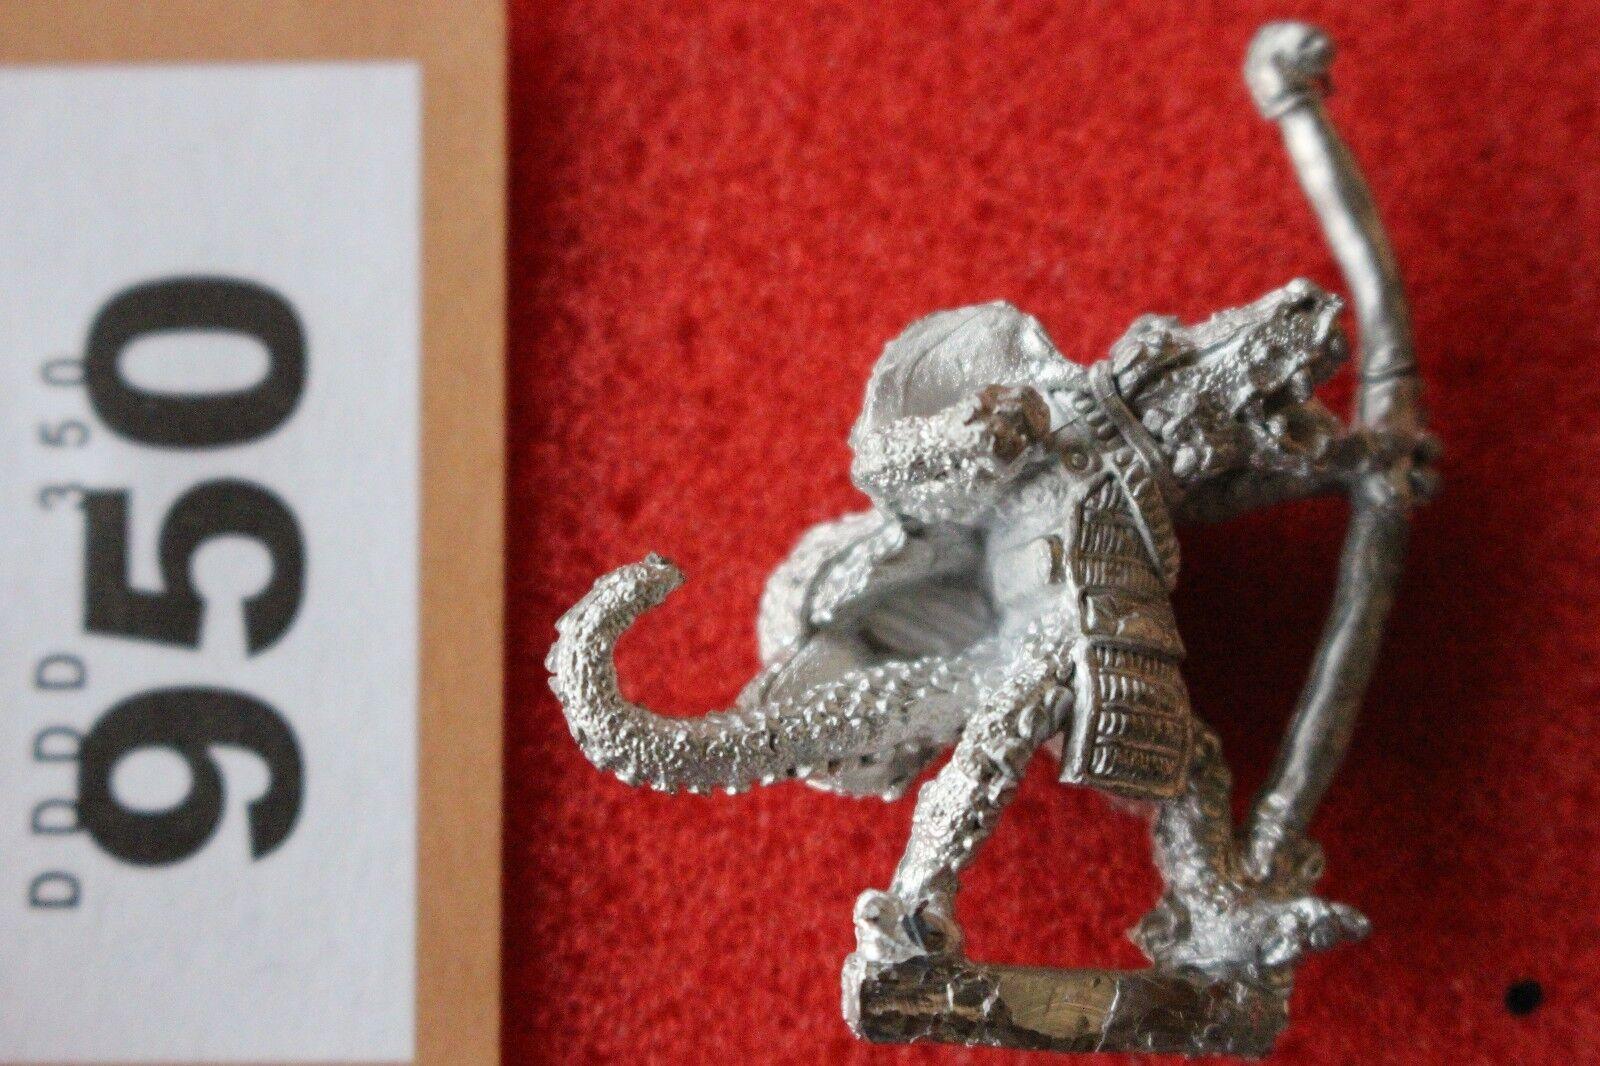 Games workshop zitadelle c19 lizardmen lizardman knar knappe metall warhammer minze